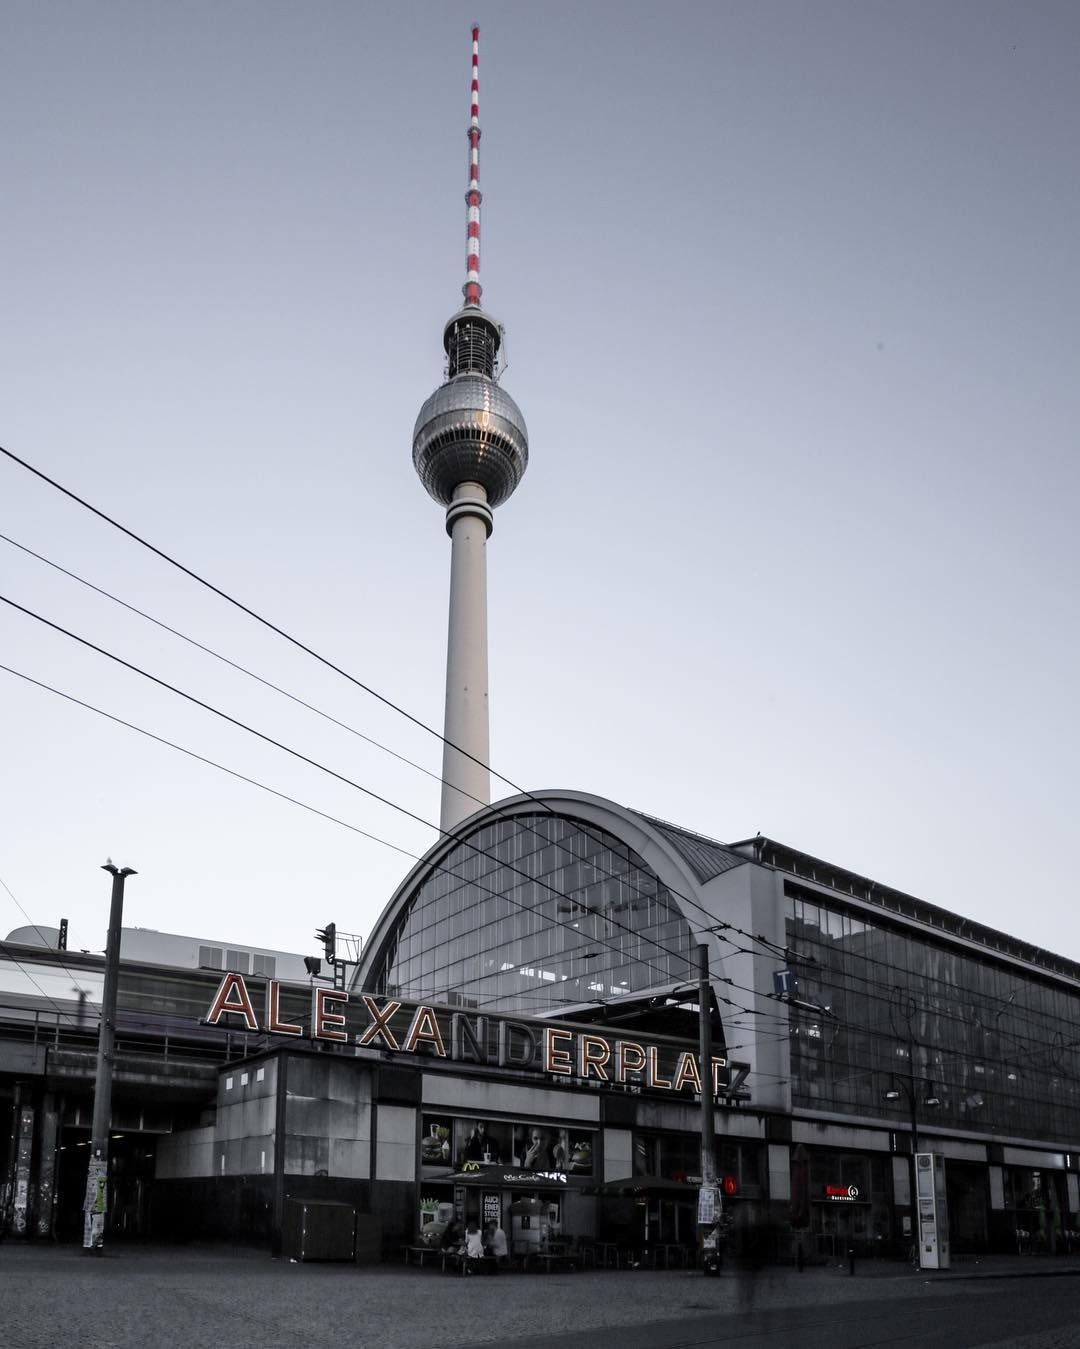 Iconic Alexanderplatz Berlin Germany Netherlands